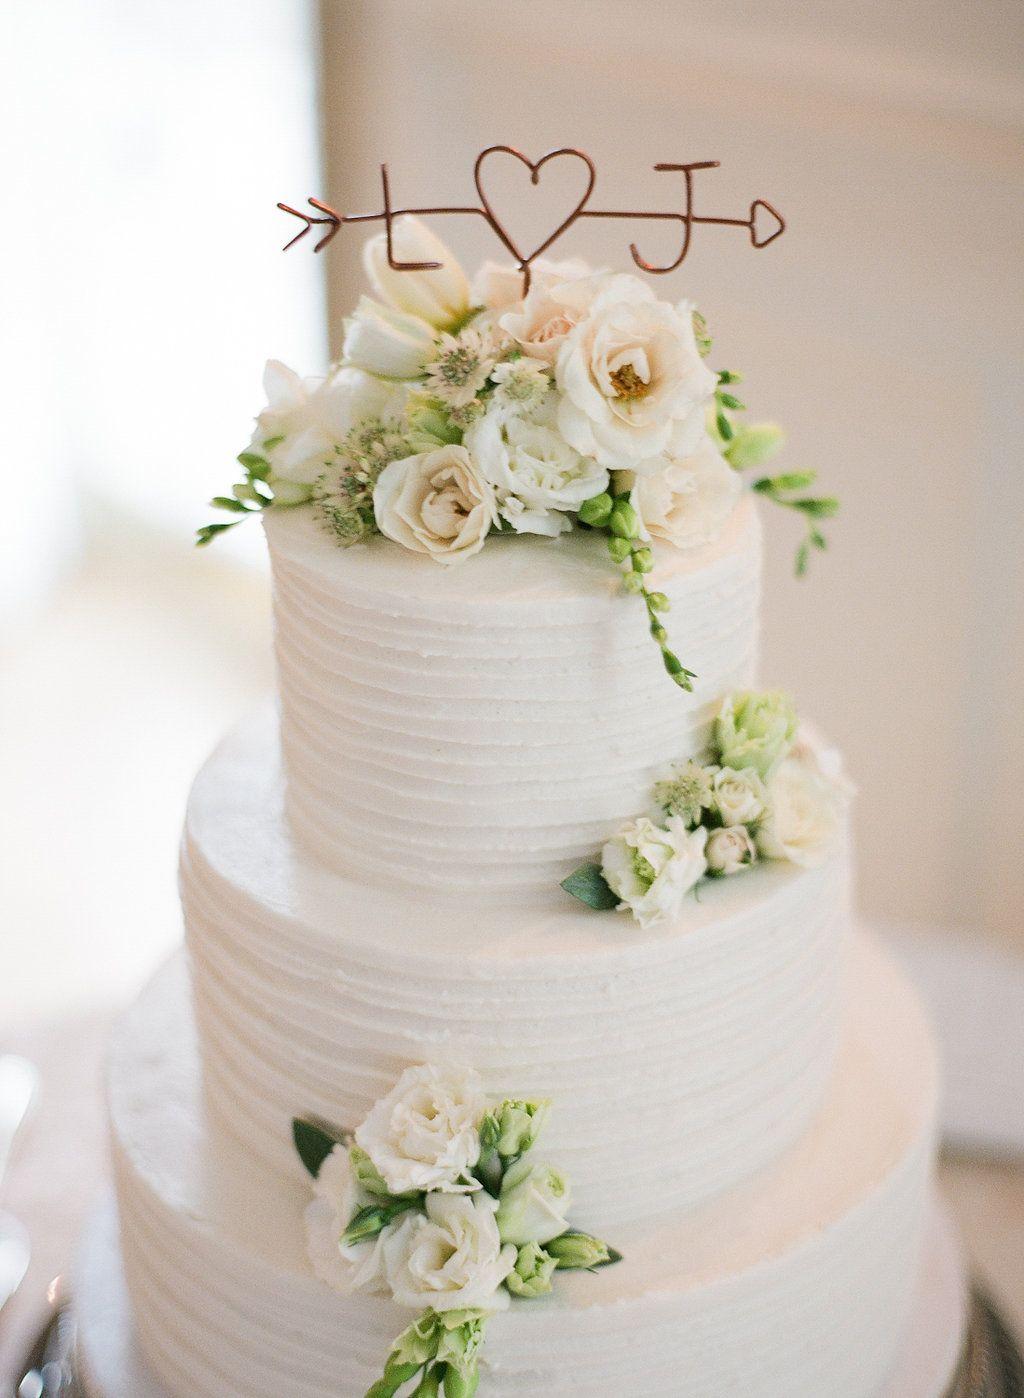 Weddings   Tourterelle Floral Design is part of Romantic wedding cake -